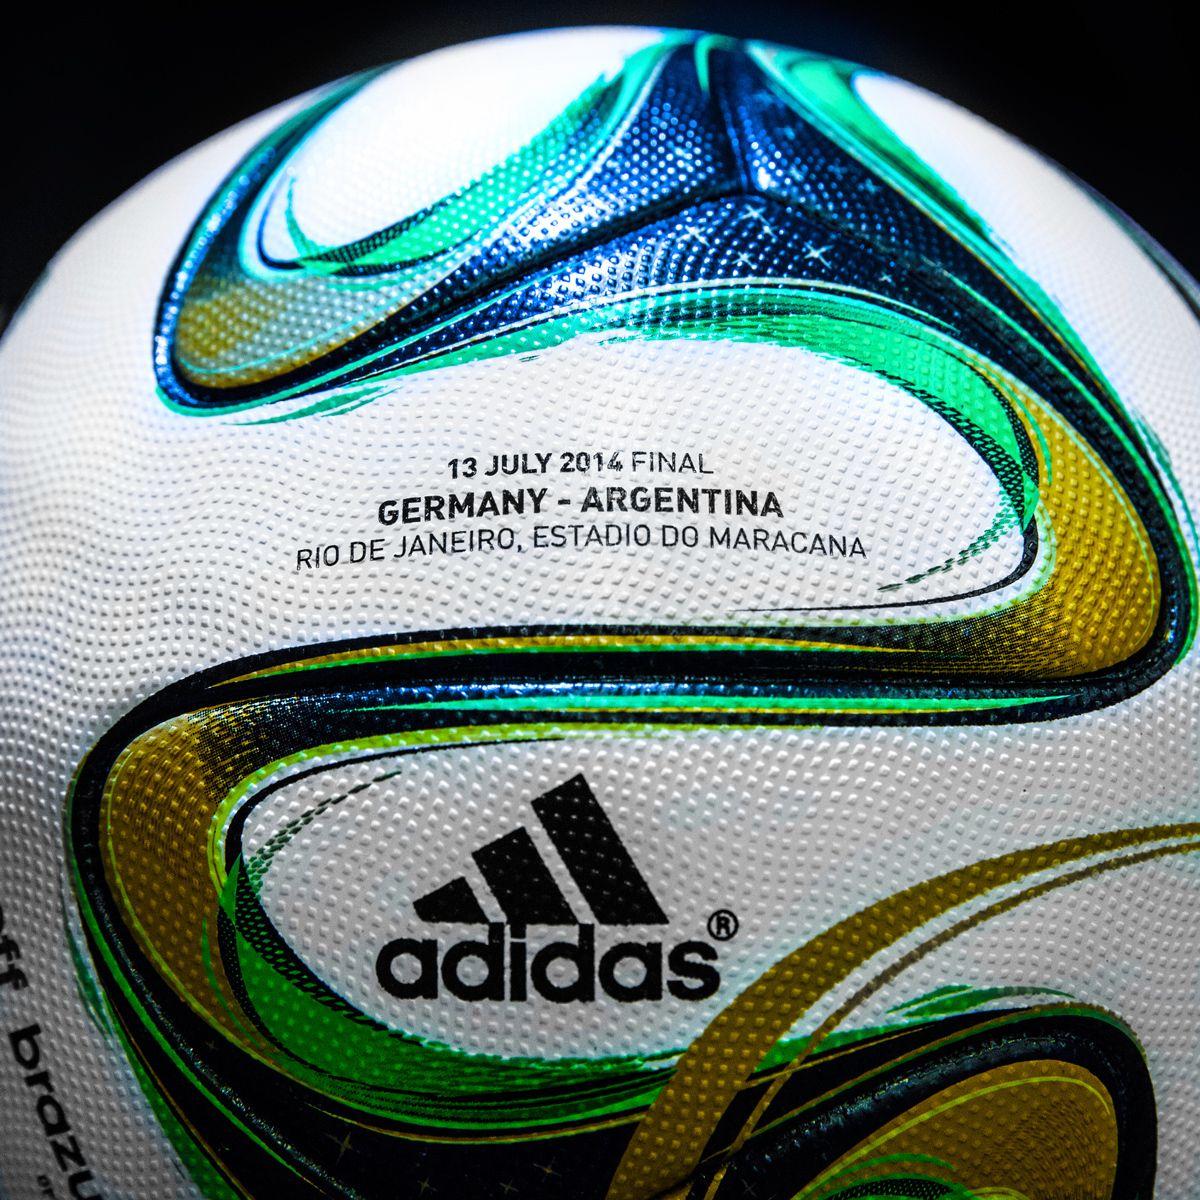 Fifa World Cup 2014 Brazil Final Ball Adidas World Cup Final World Cup Germany Vs